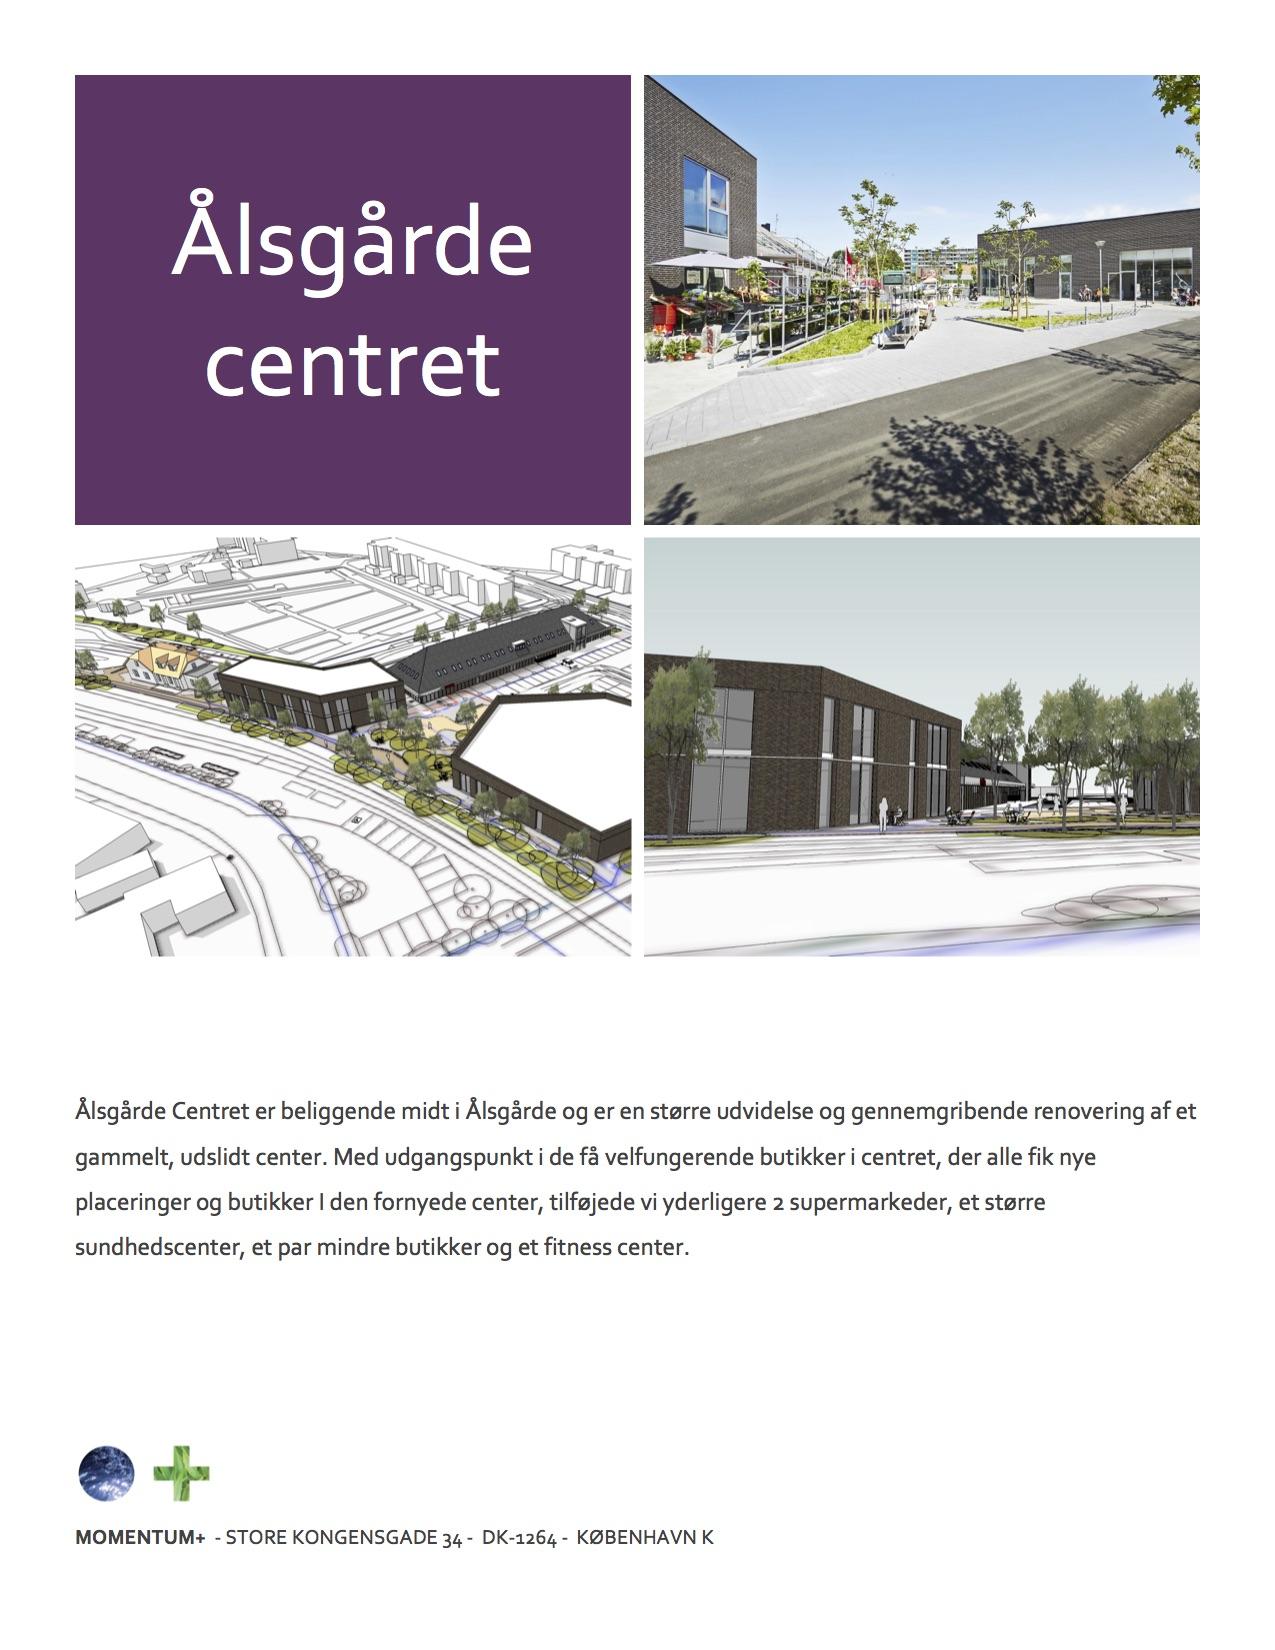 Ålsgårde - 3 ref. .jpg